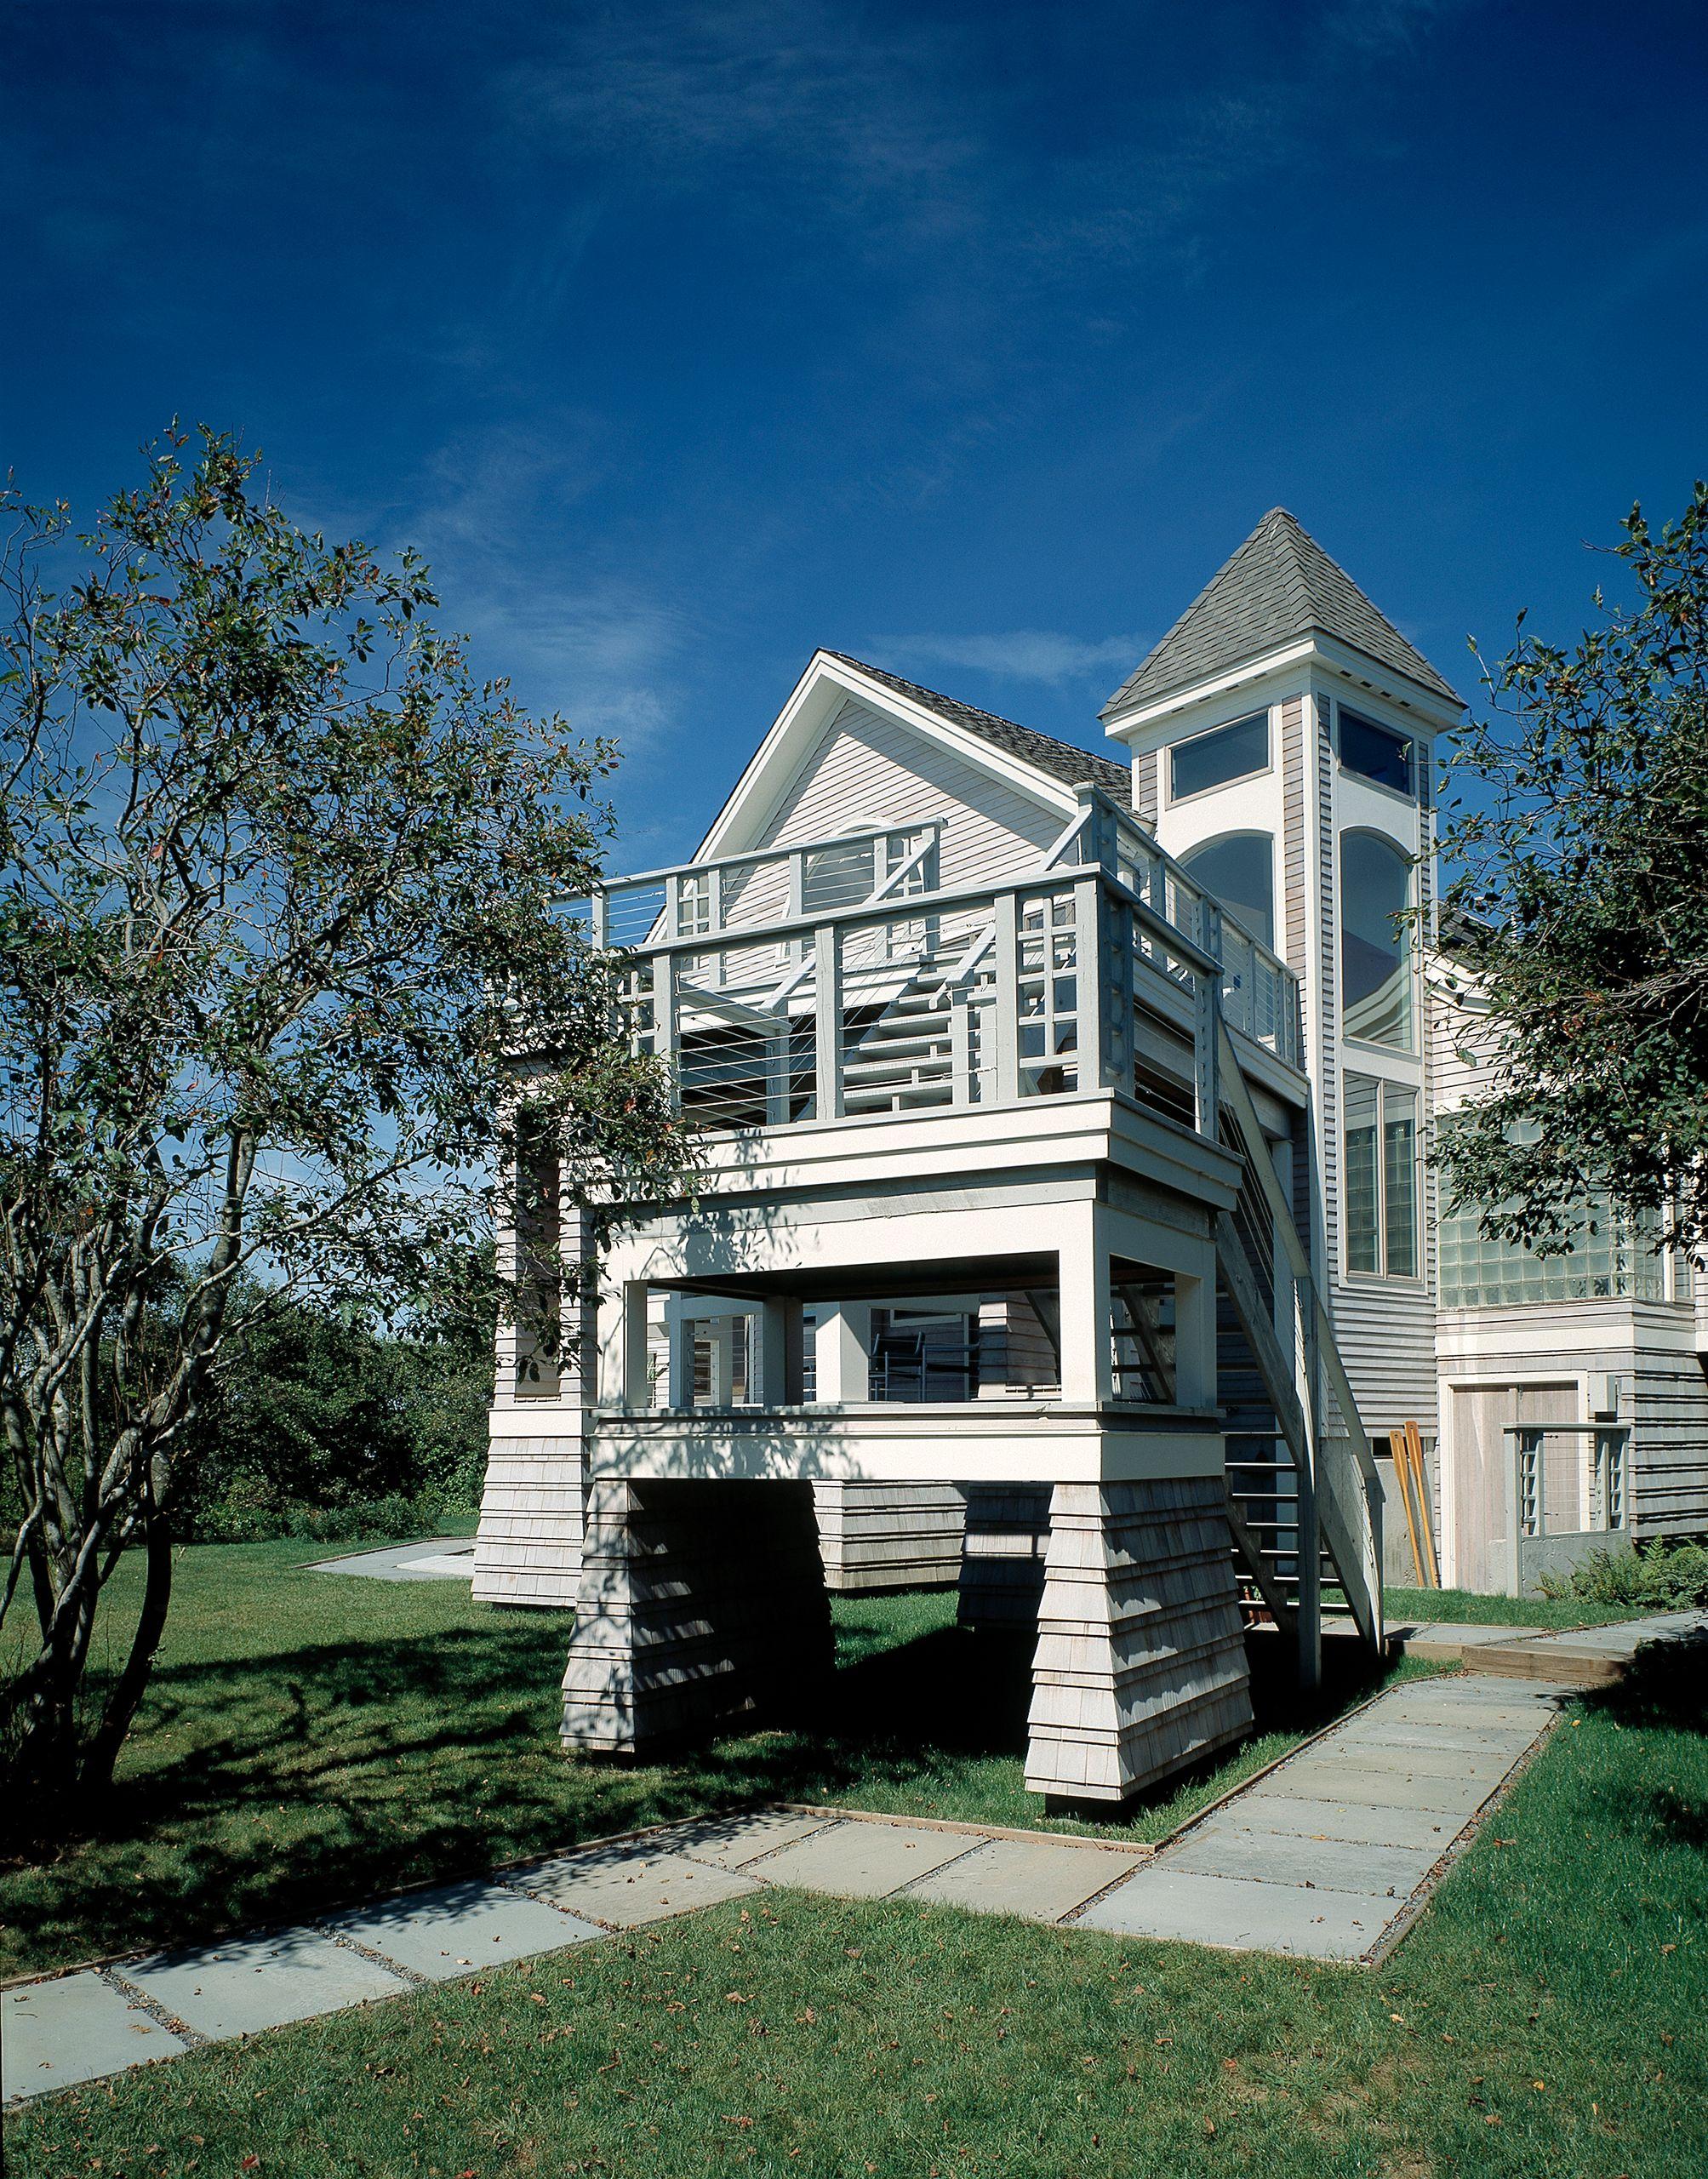 IslandHouse-SKingstownRI-ExteriorStair.jpg